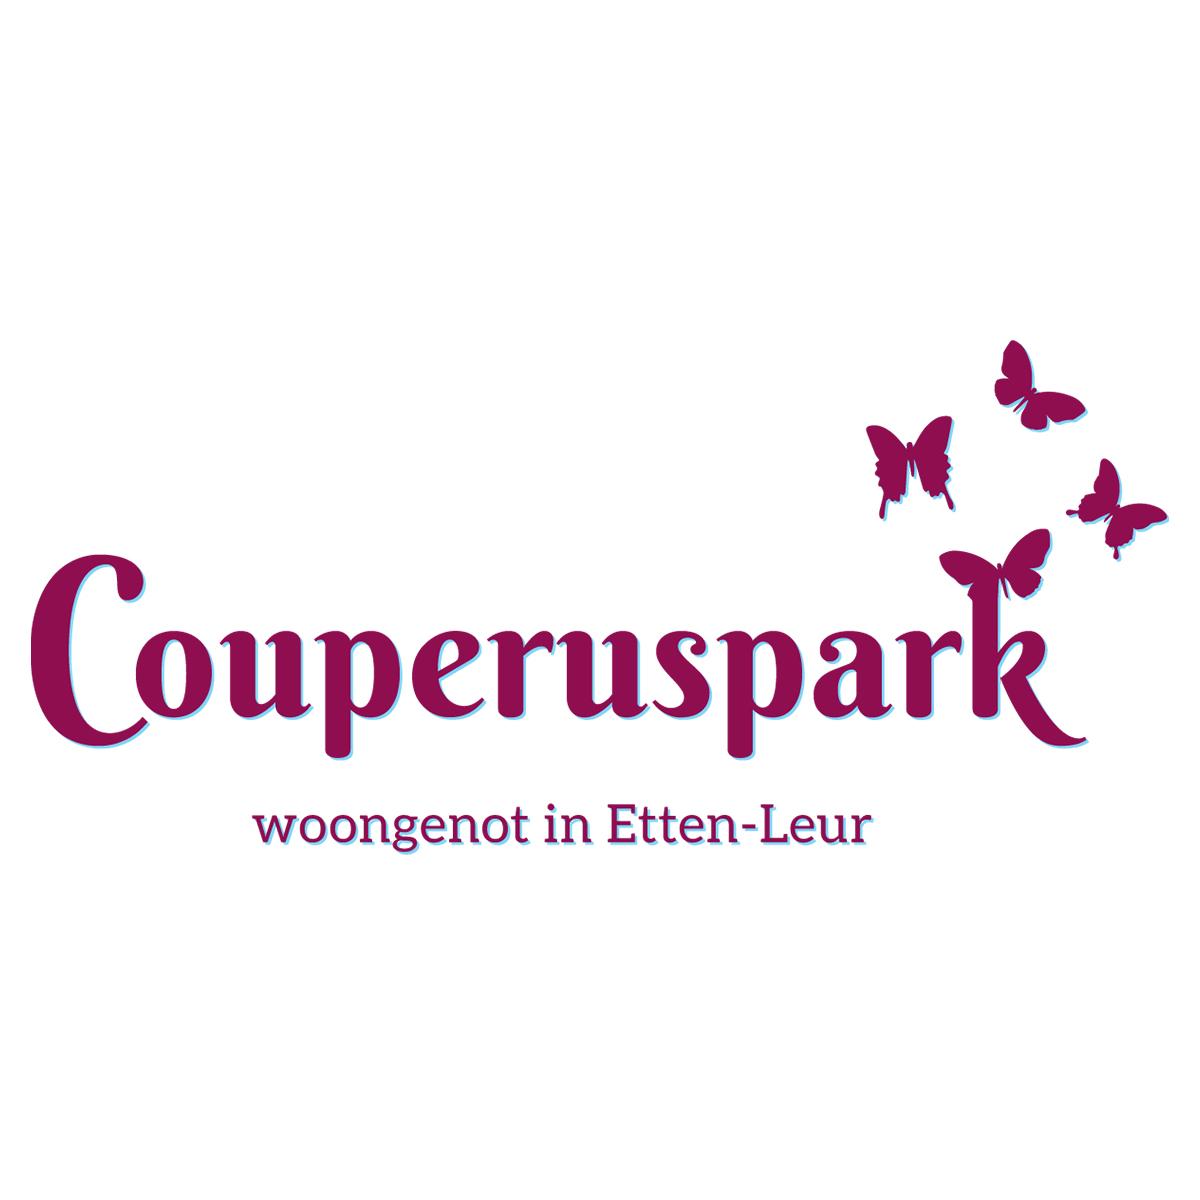 Couperuspark